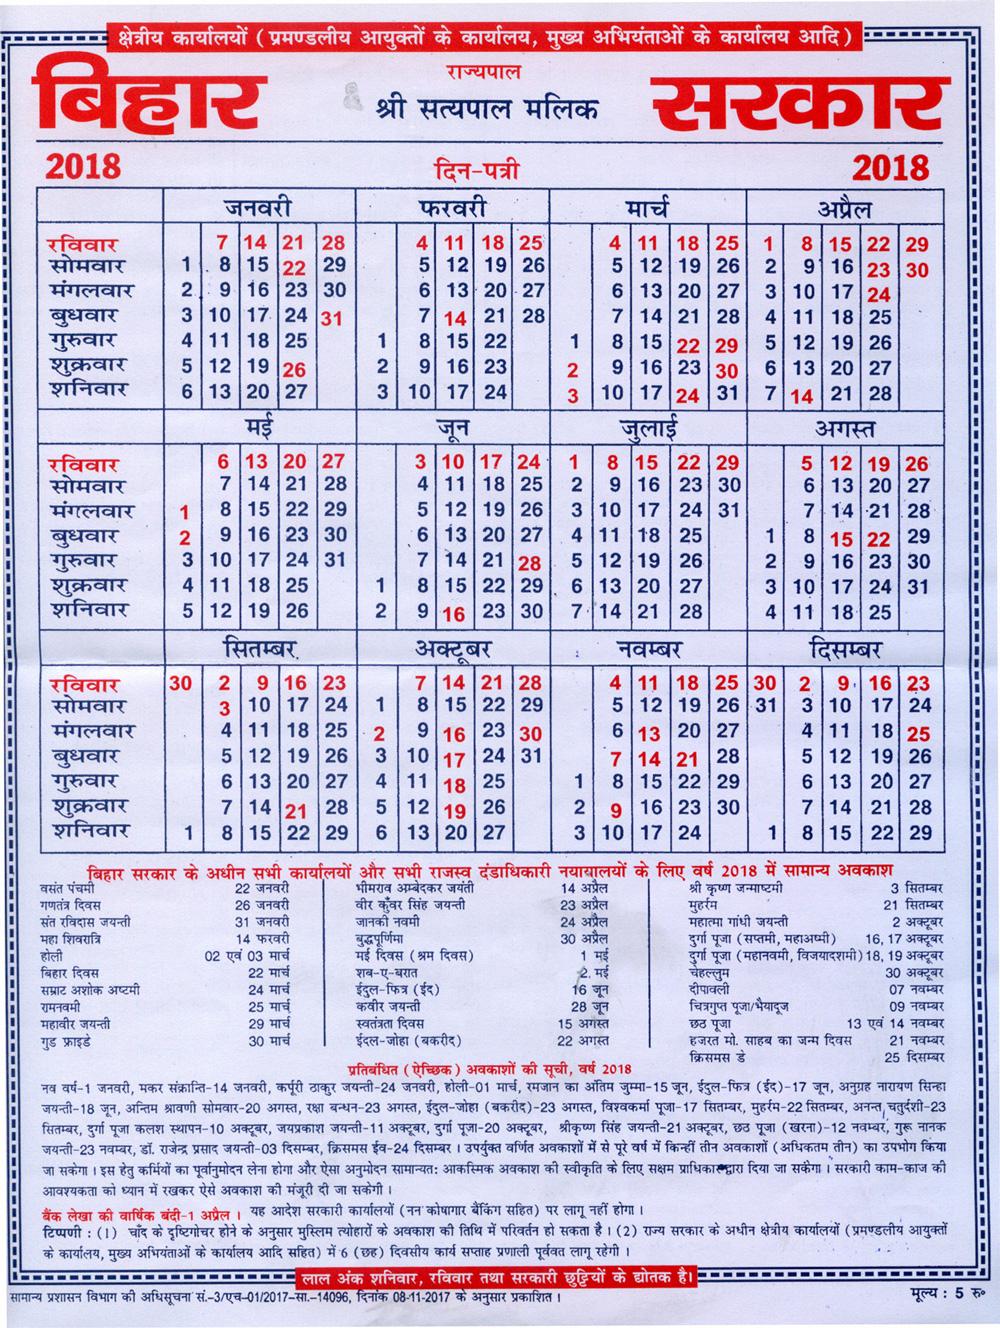 Bihar Govt. Calendar 2018, Bihar Govt. Holiday List, Holiday pertaining to Bihar Govt Official Calendar 2020